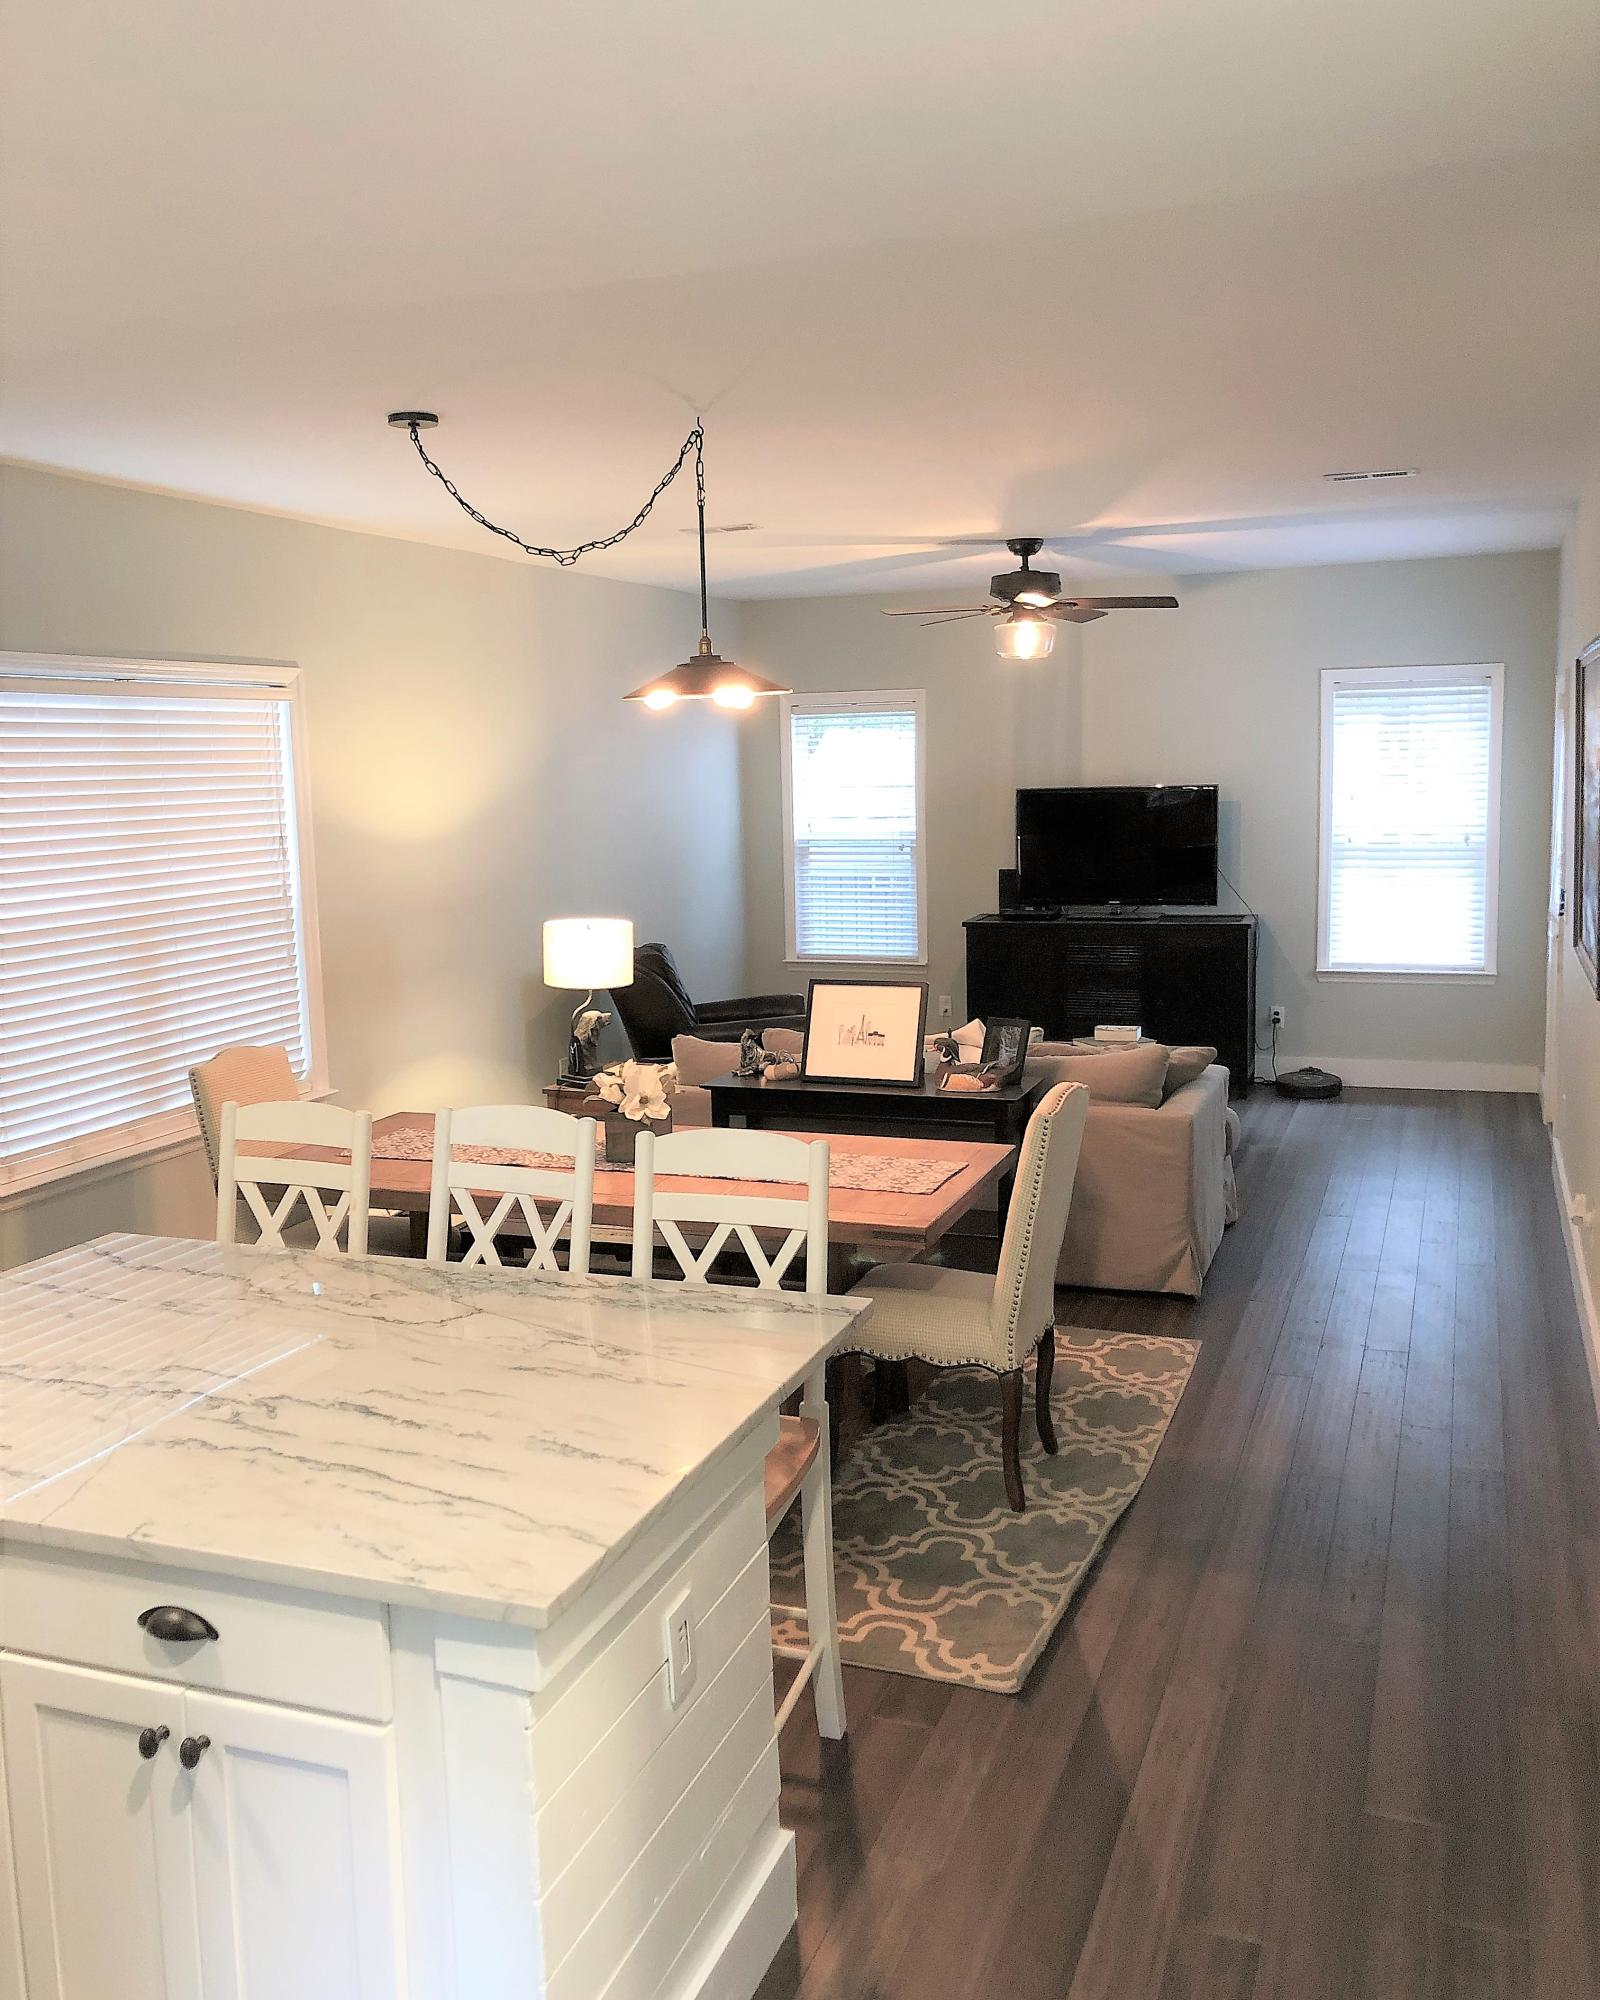 Fairway Villas Homes For Sale - 1542 Little Rock, Charleston, SC - 9